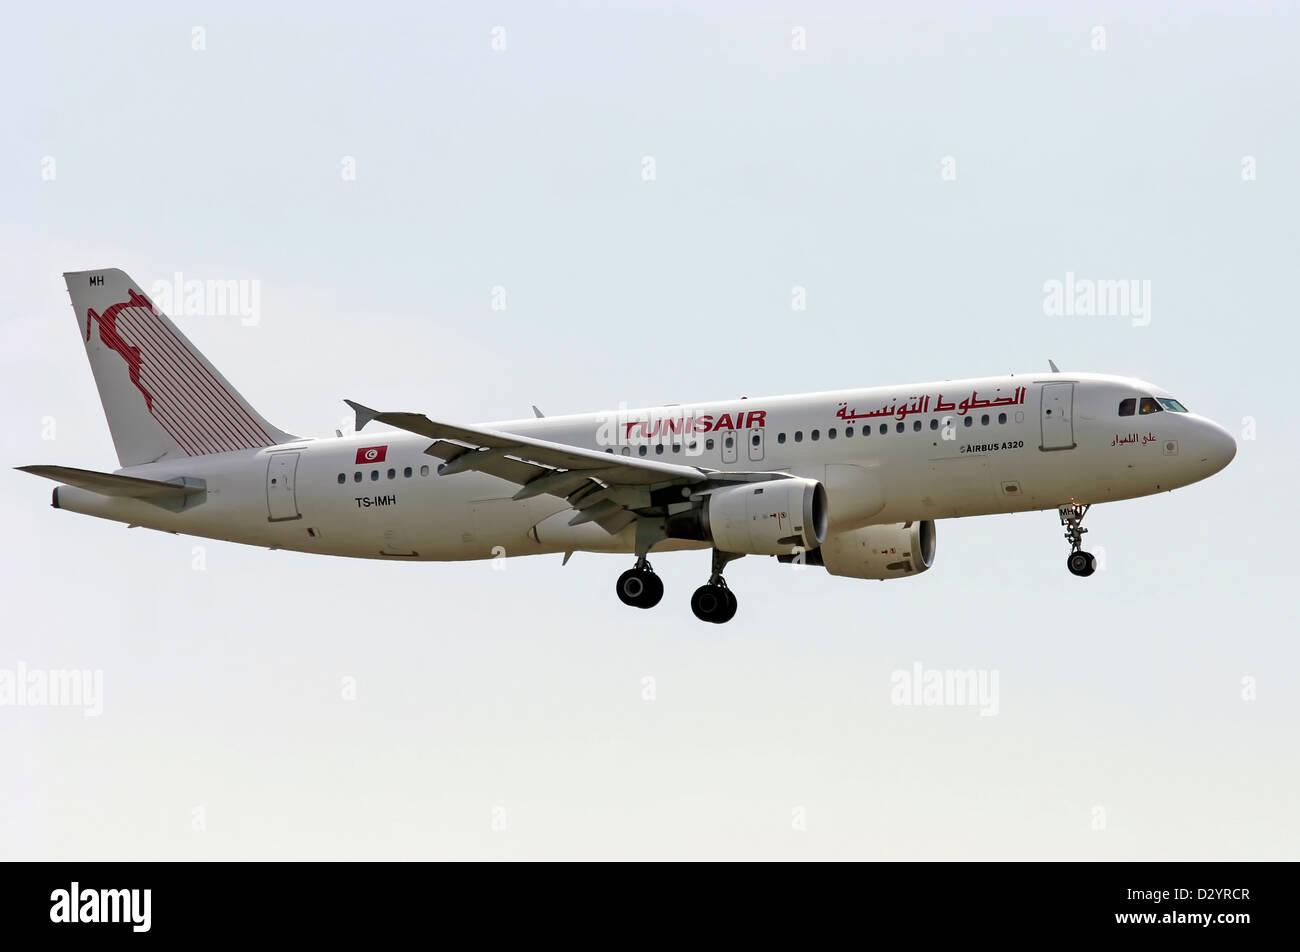 Tunisair, Airbus A320 - Stock Image